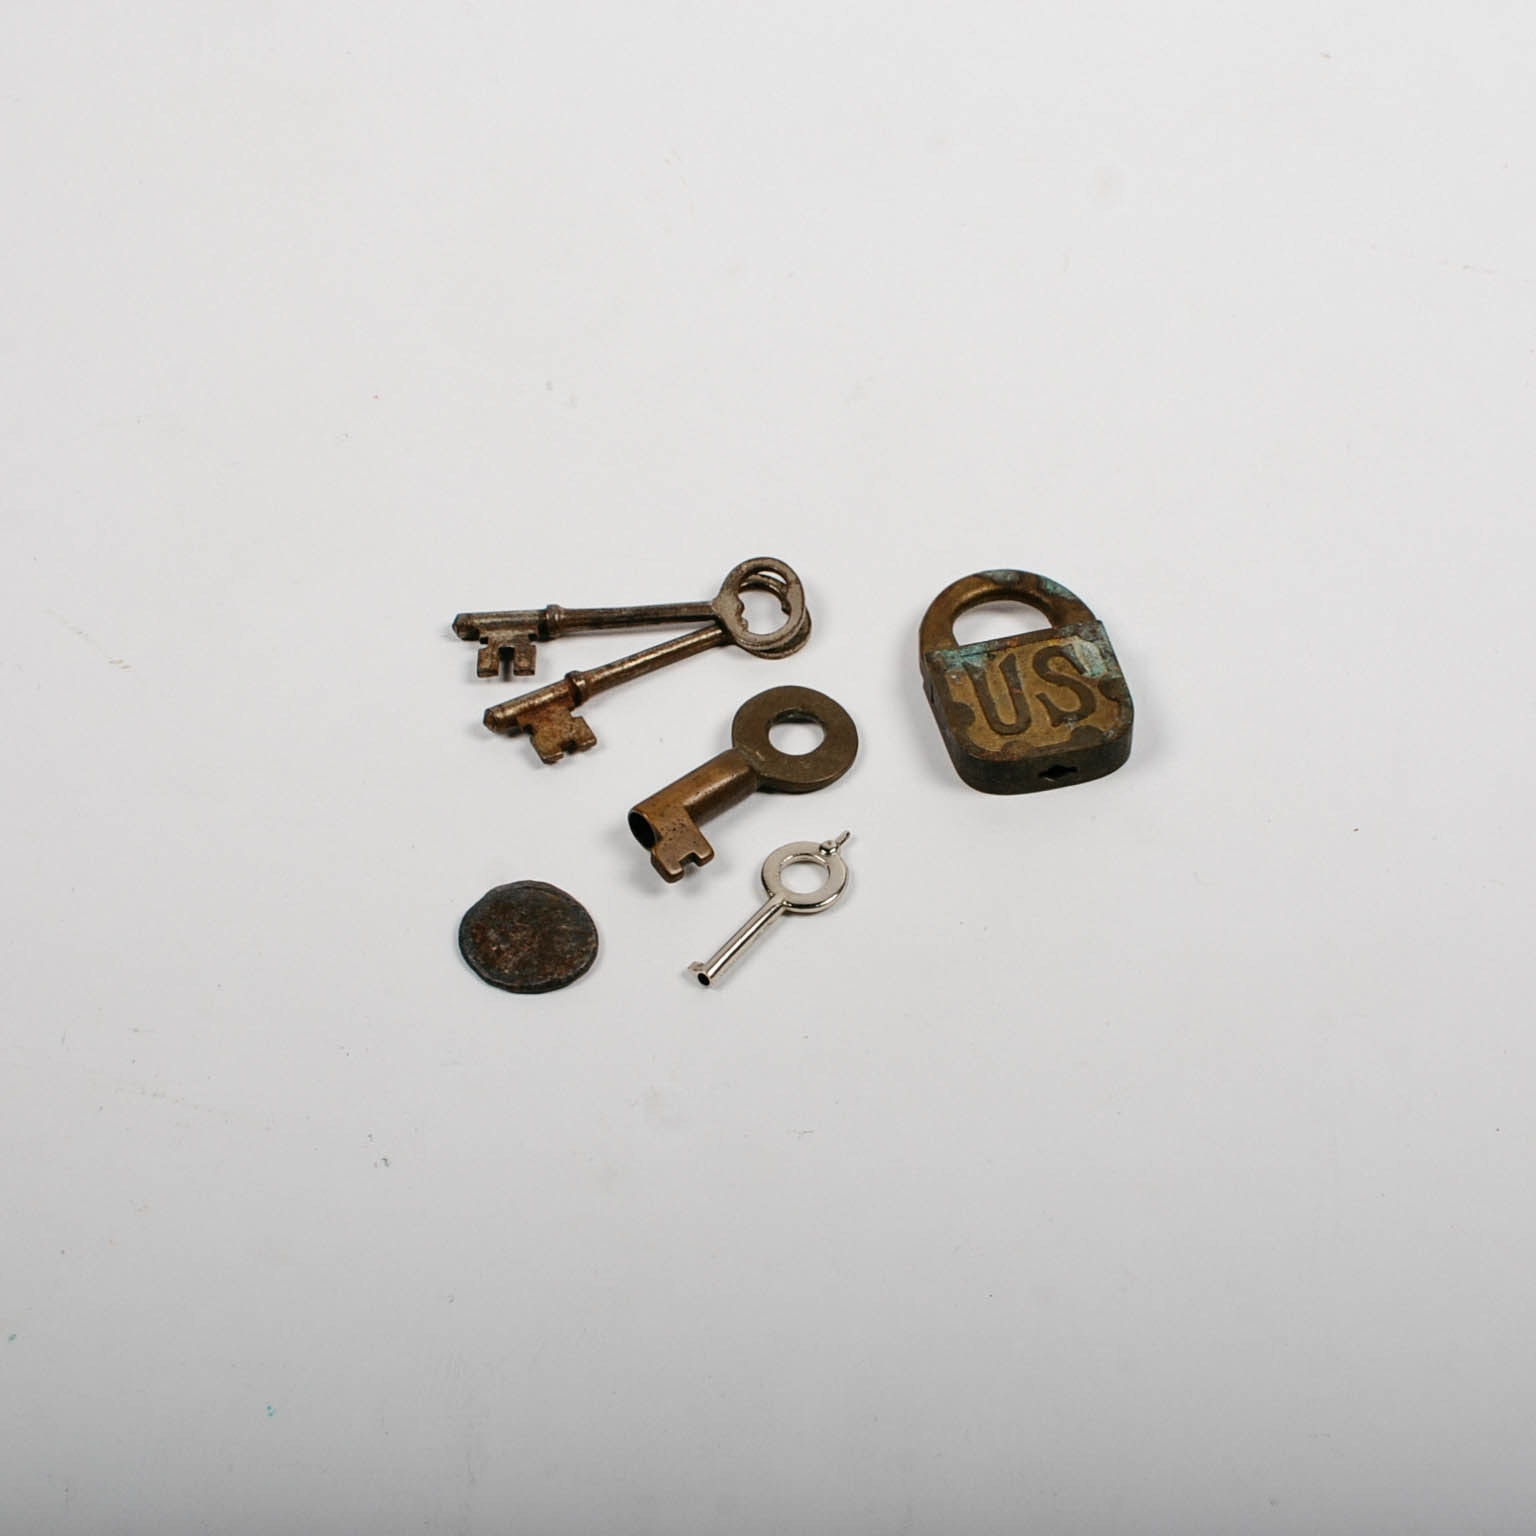 Antique World War 1 Wwi 1917 Us Army Padlock Brass Lock